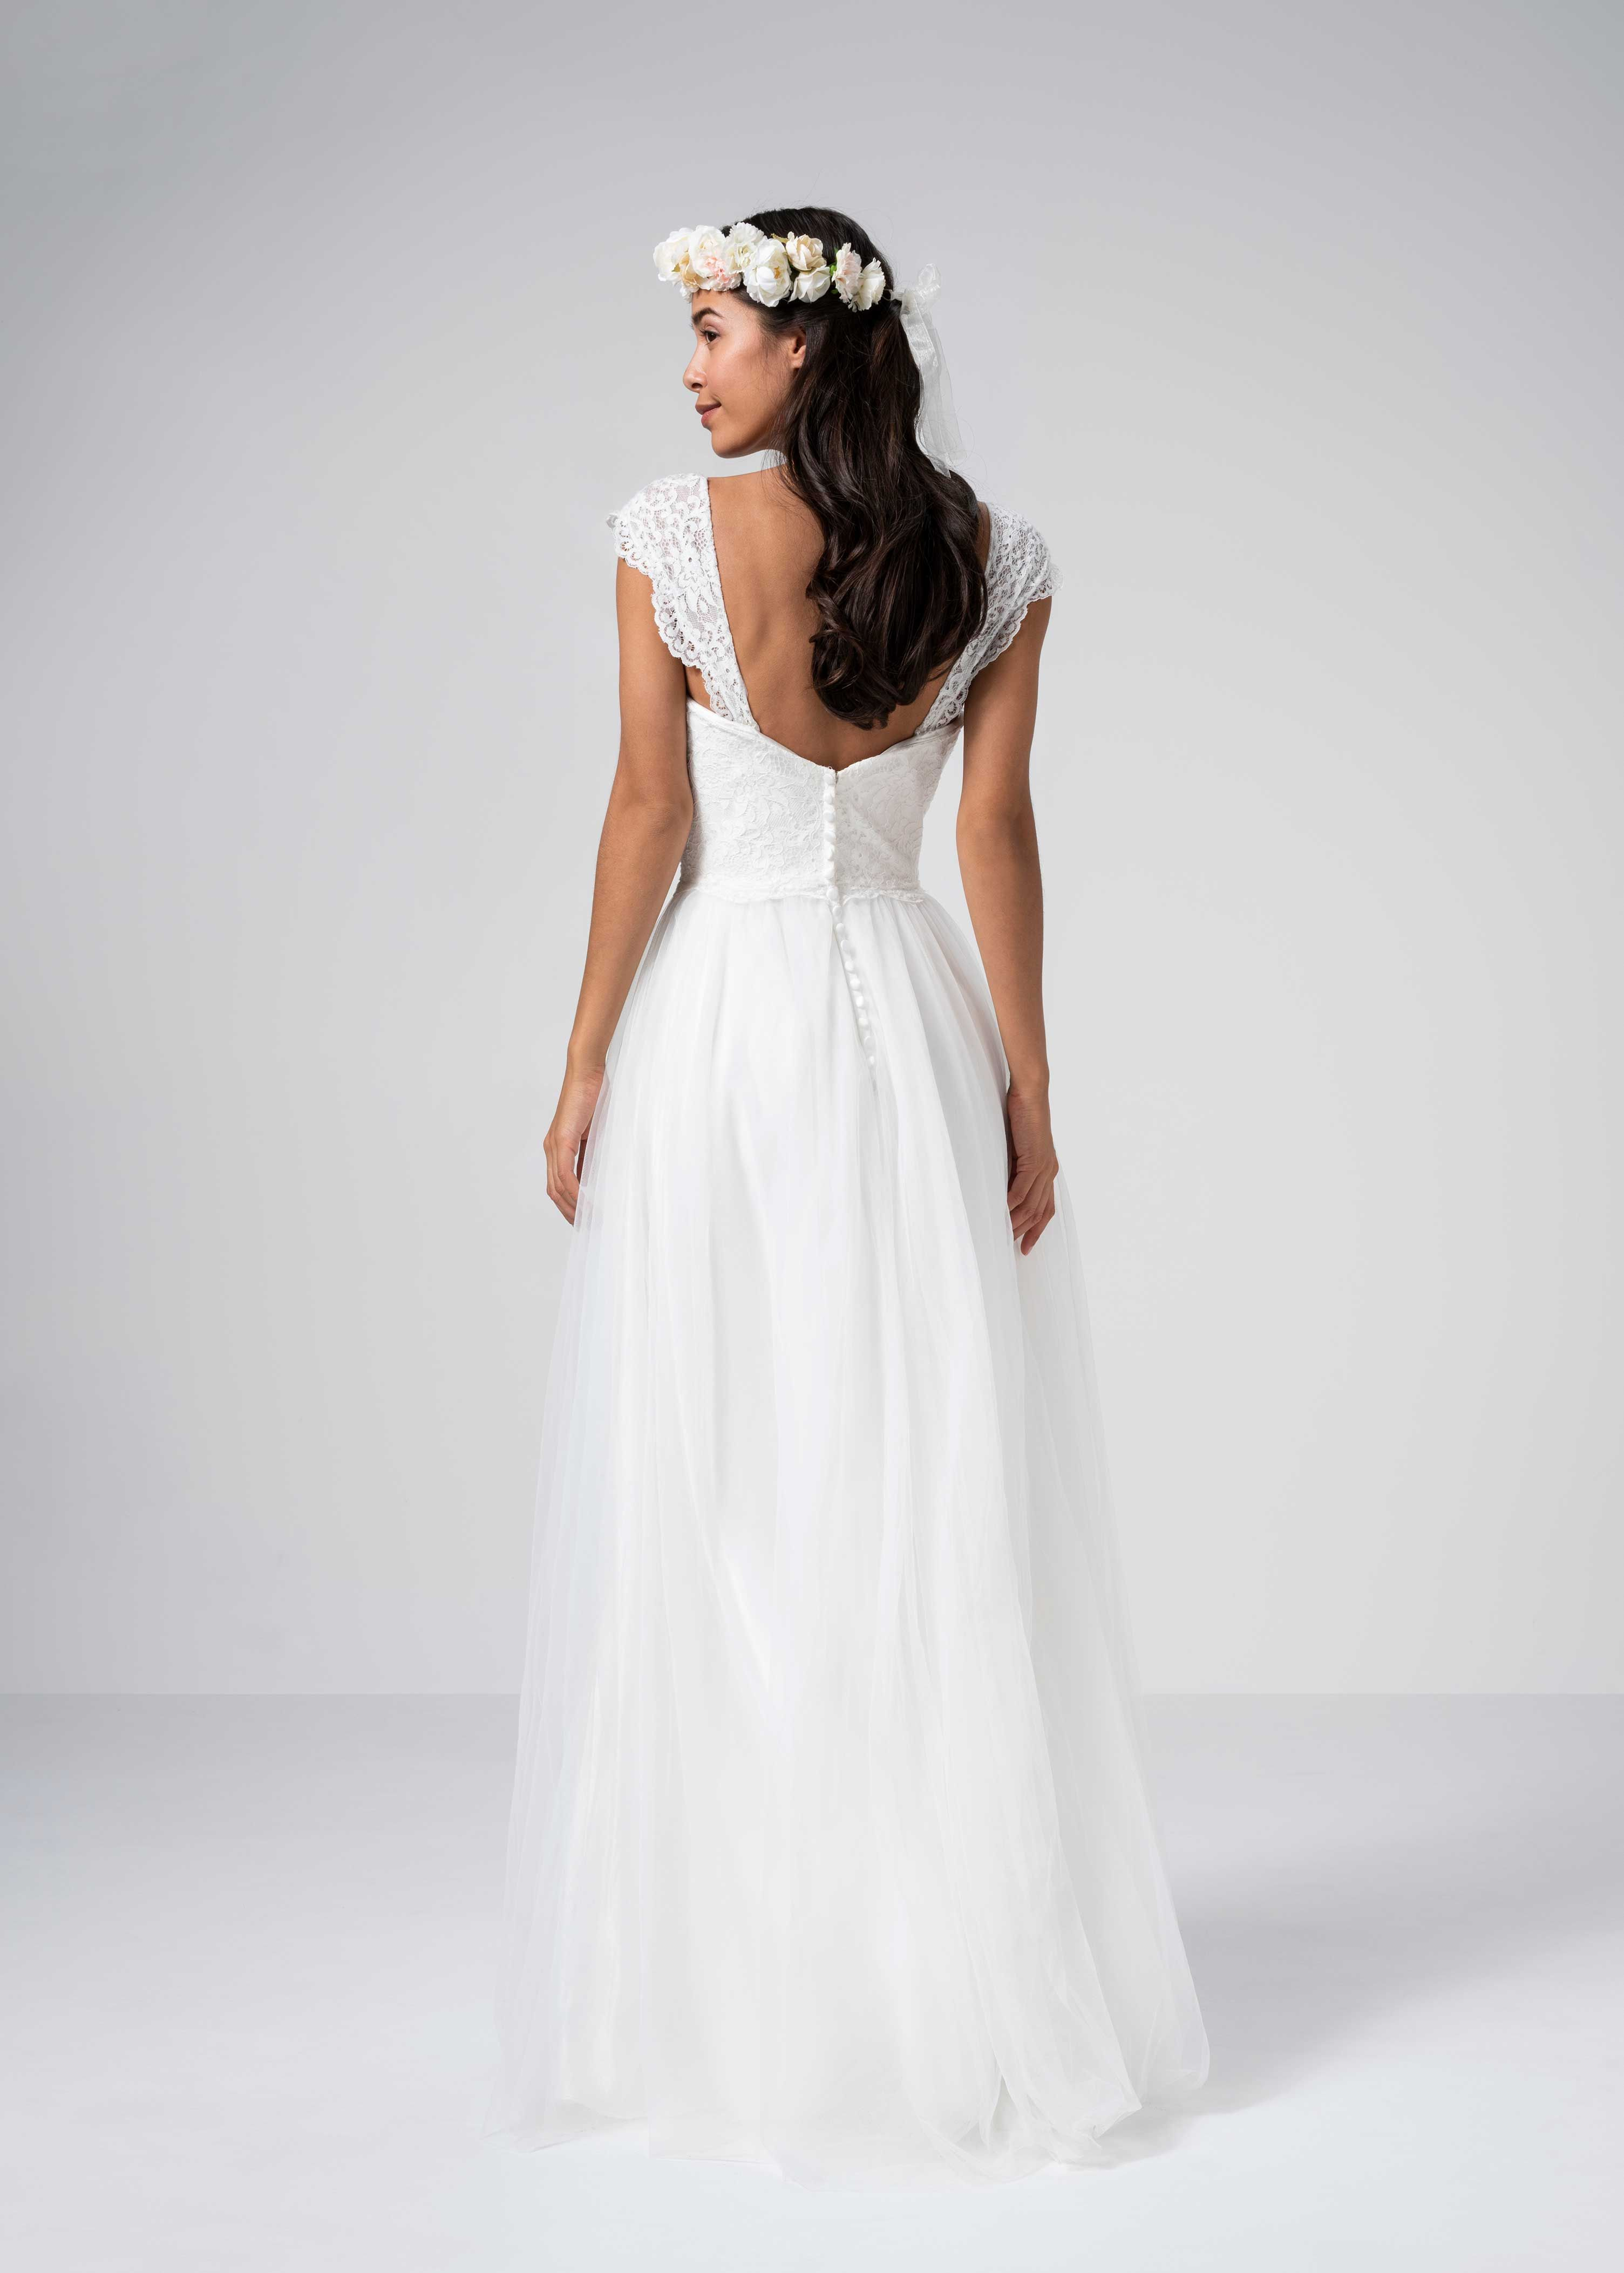 Romantic Bridal Dress for all 10 Bride  Brautmode, Braut